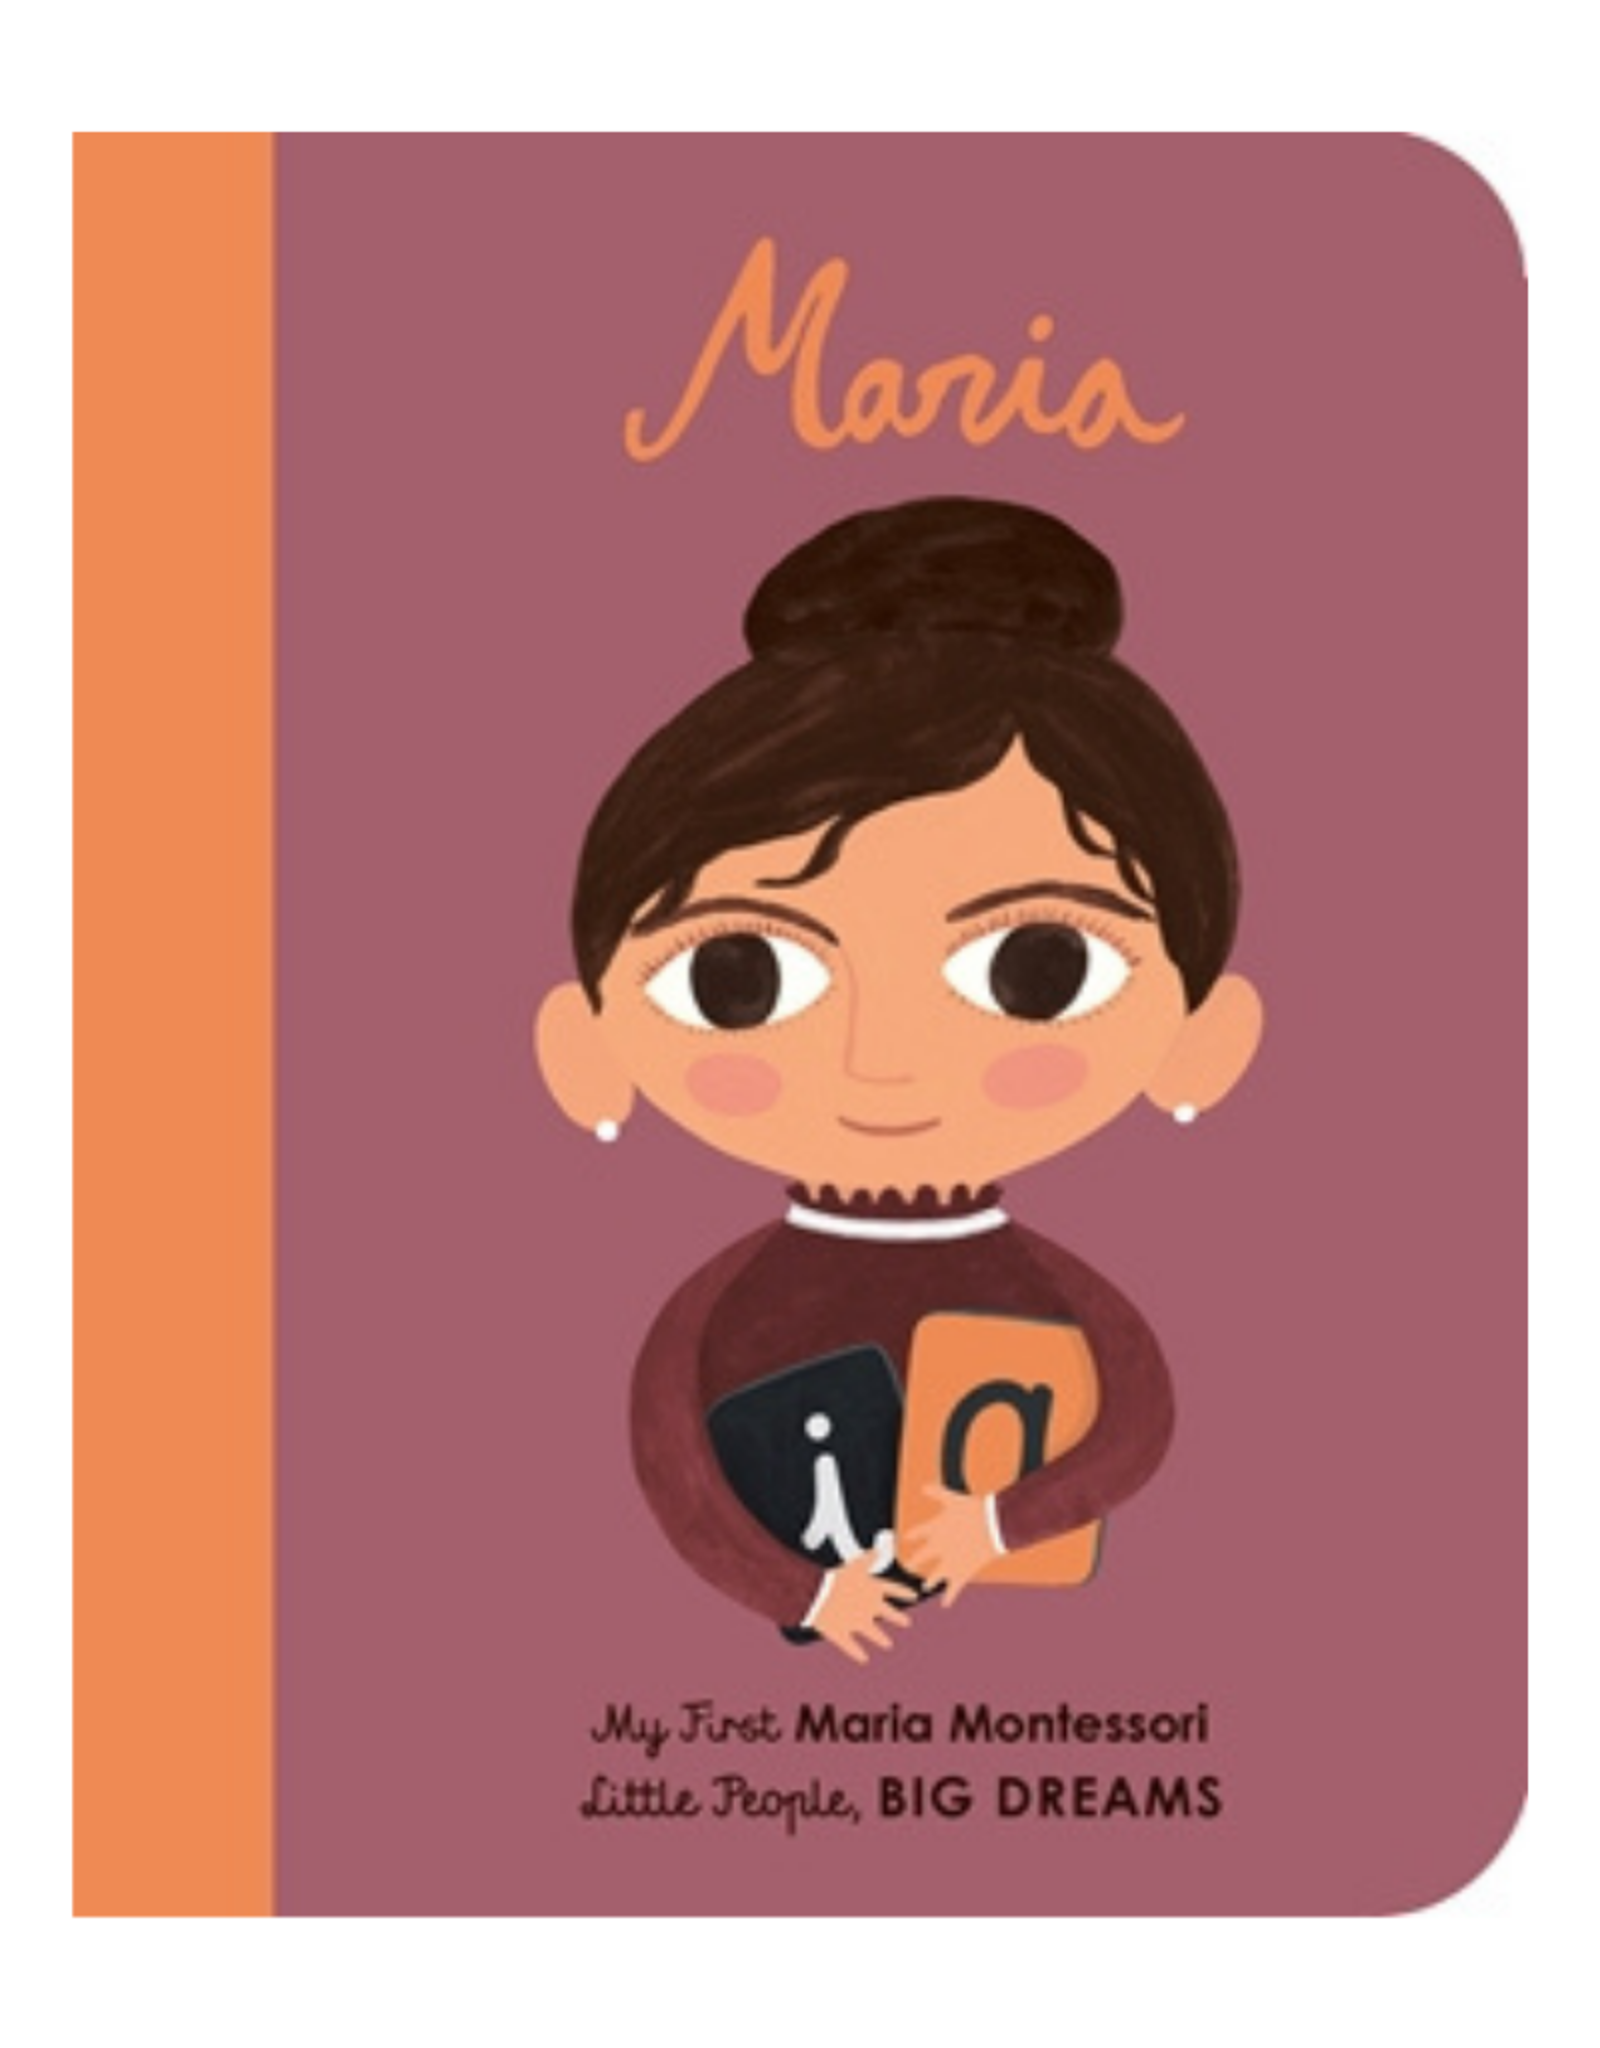 My First Maria Montessori by Isabel Sanchez Vegara and Natascha Rosenberg